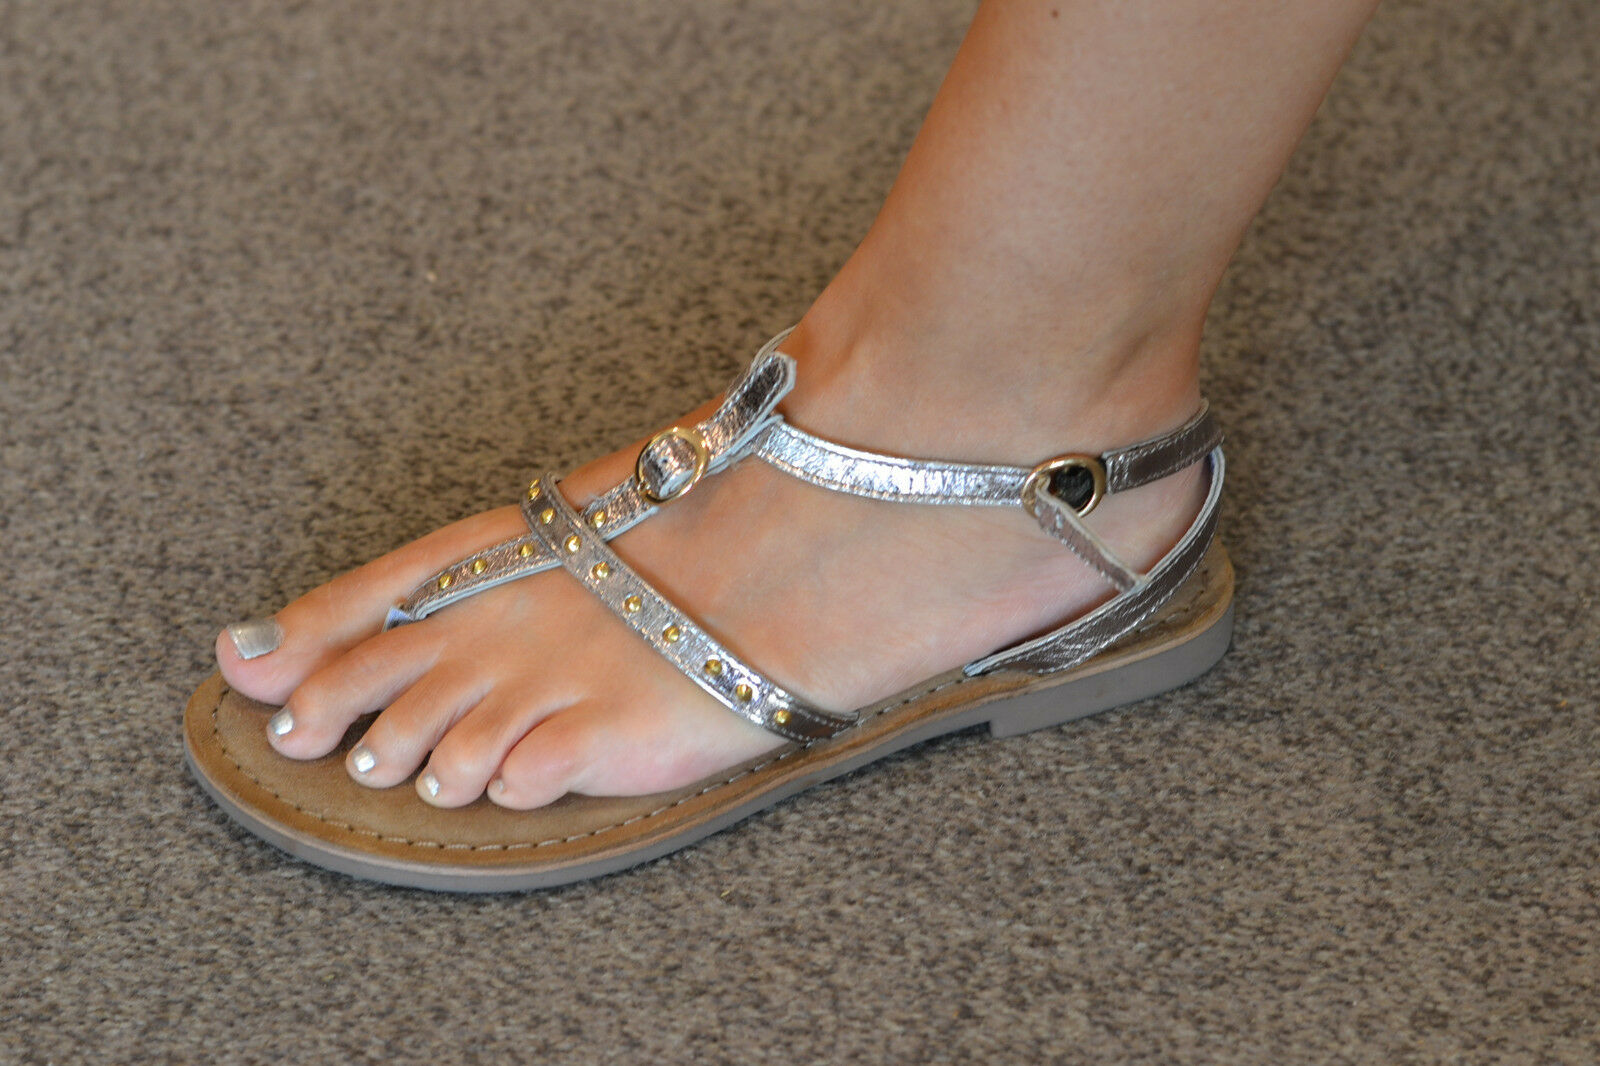 LAZAMANI Damen Schuhe Pantolette Sandalette Sandale sillber flach NEU rotUZIERT